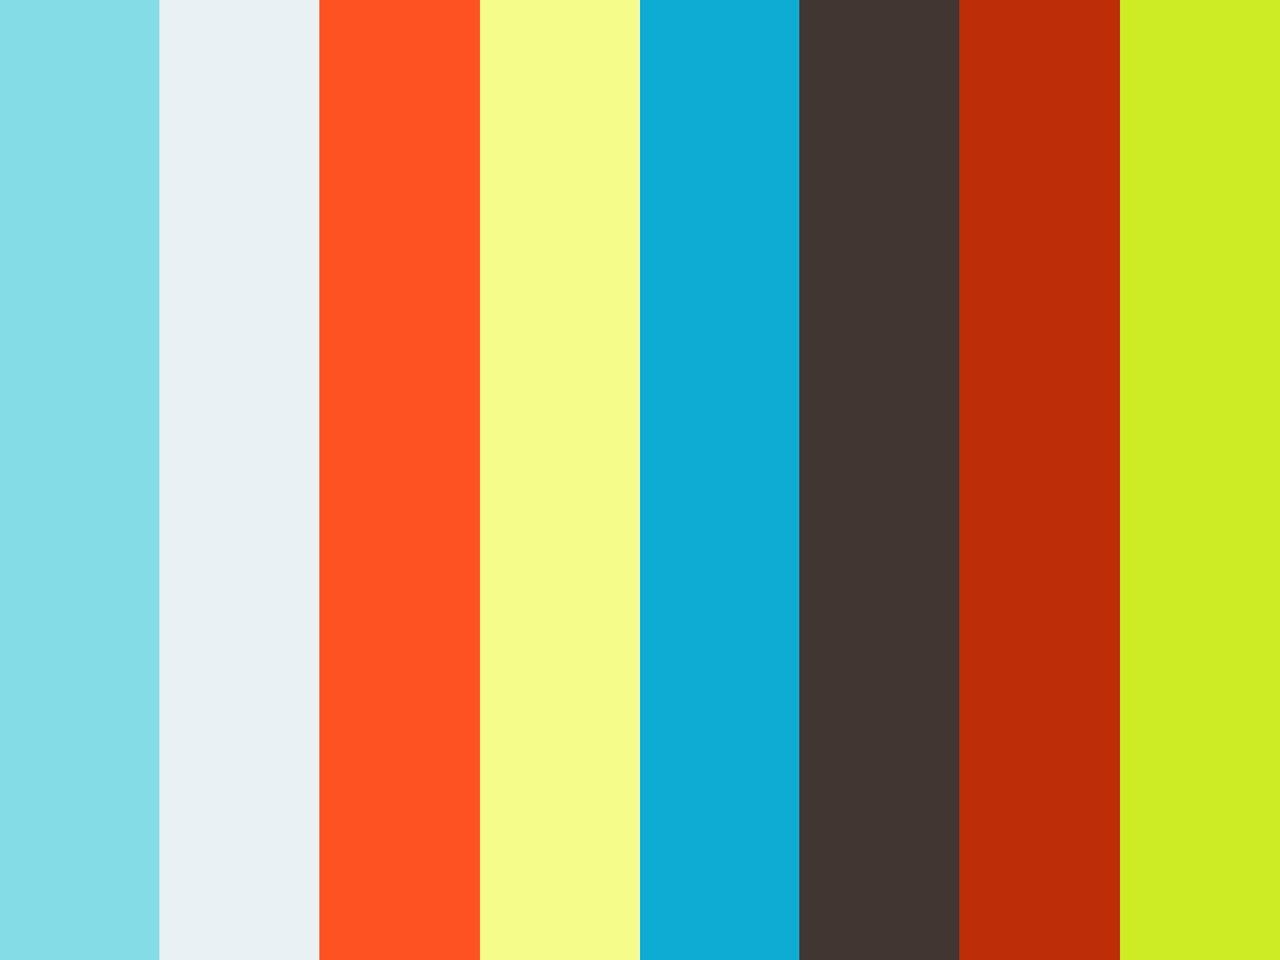 SALA BBK - BILBAO BLACK EXPERIENCE 2015 - GOSPEL BILBAO